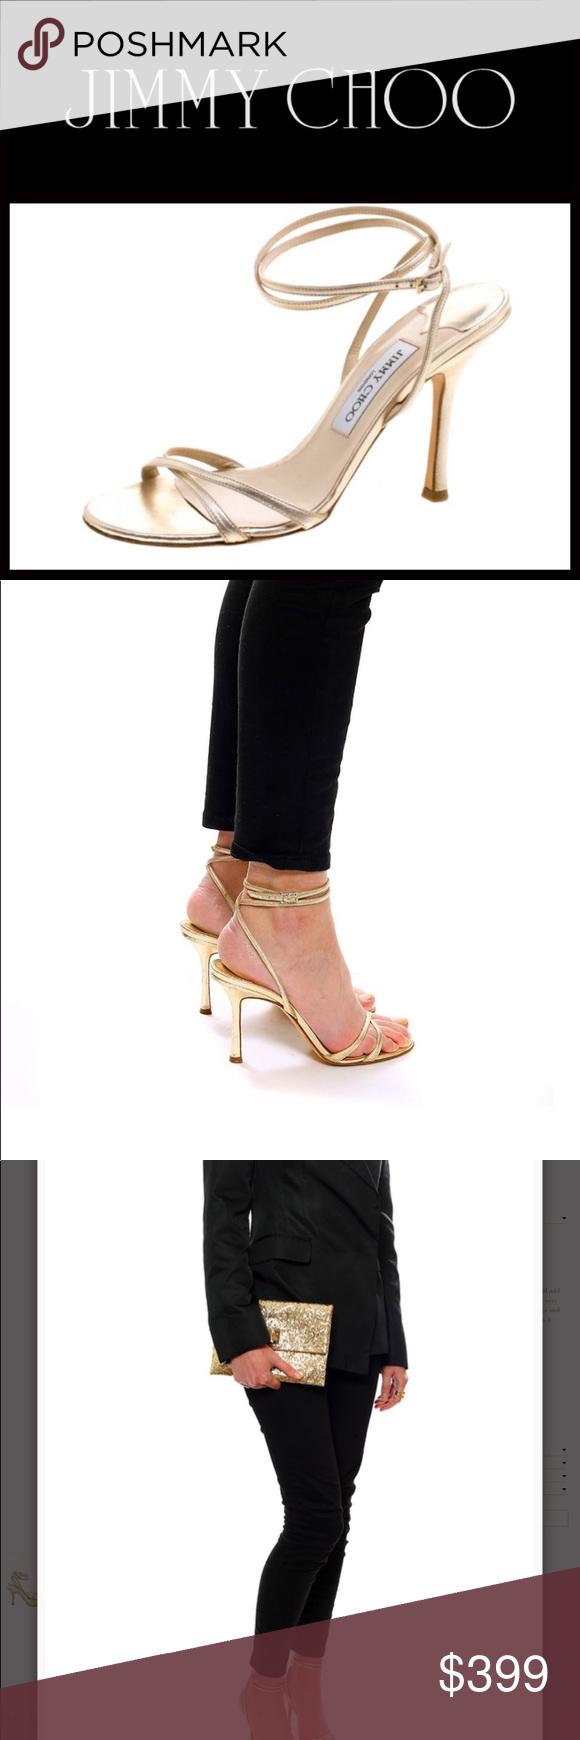 Jimmy Choo Juliet Gold Strappy Sandal Gold Strappy Sandals Strappy Sandals Jimmy Choo